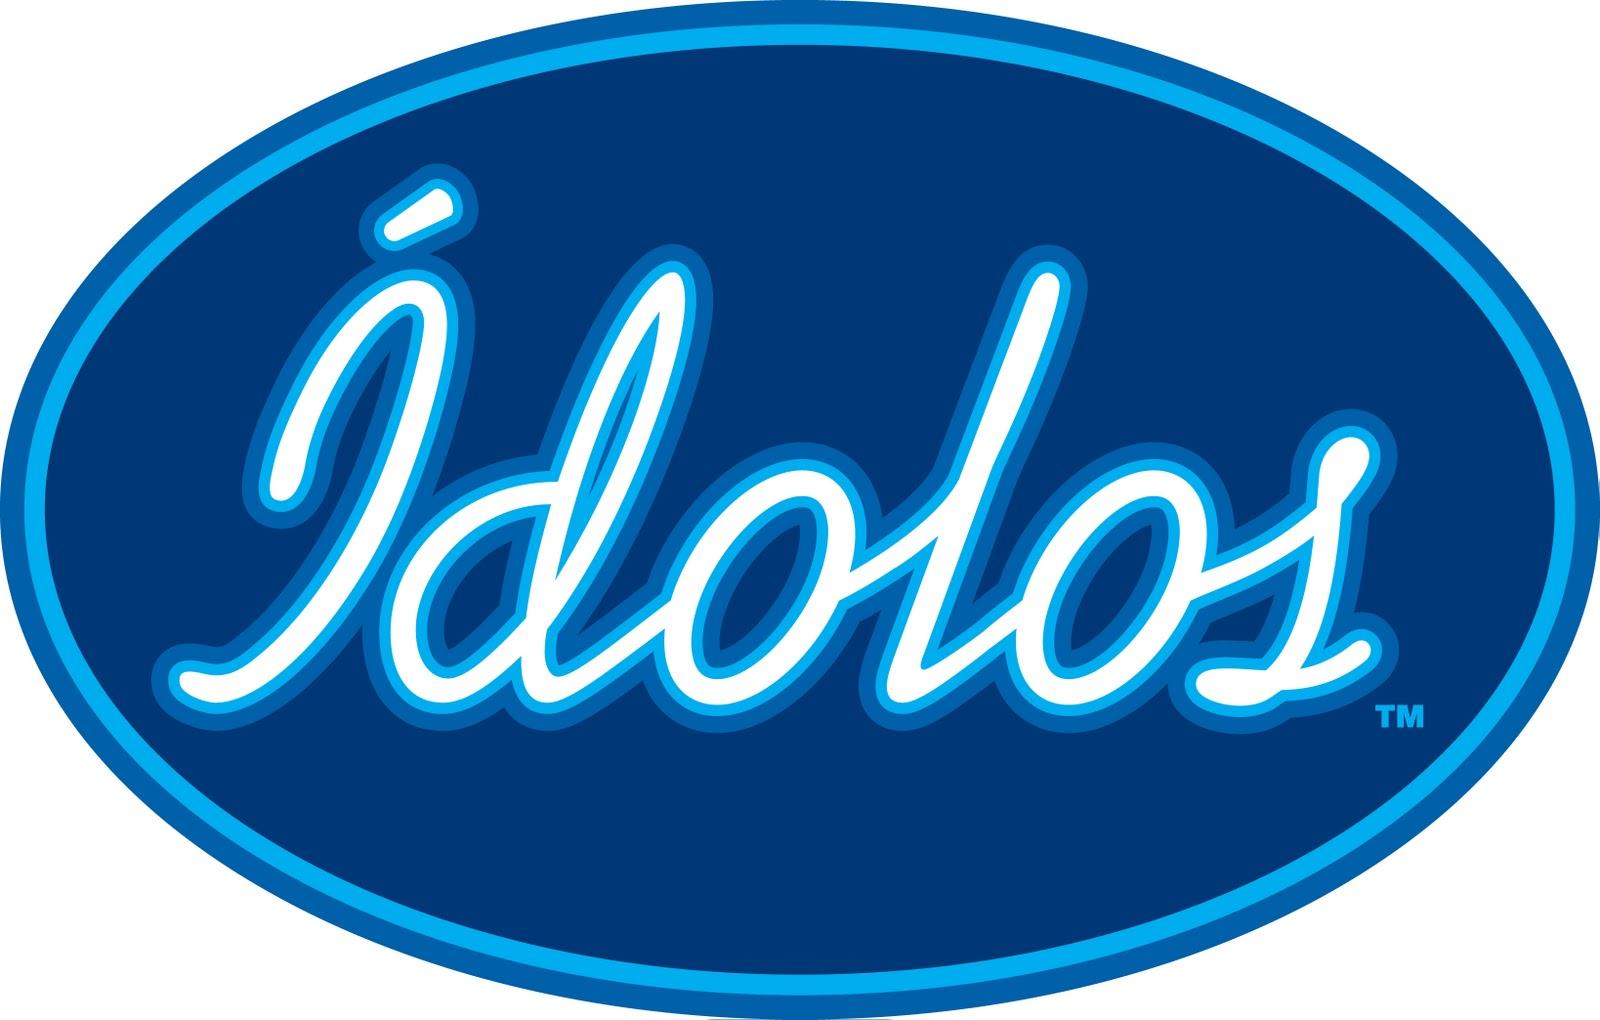 http://2.bp.blogspot.com/_kY7DG1W4Wuo/TRotvKadAlI/AAAAAAAAAFI/Kxu5GjFHvYg/s1600/logo_idolos.jpg